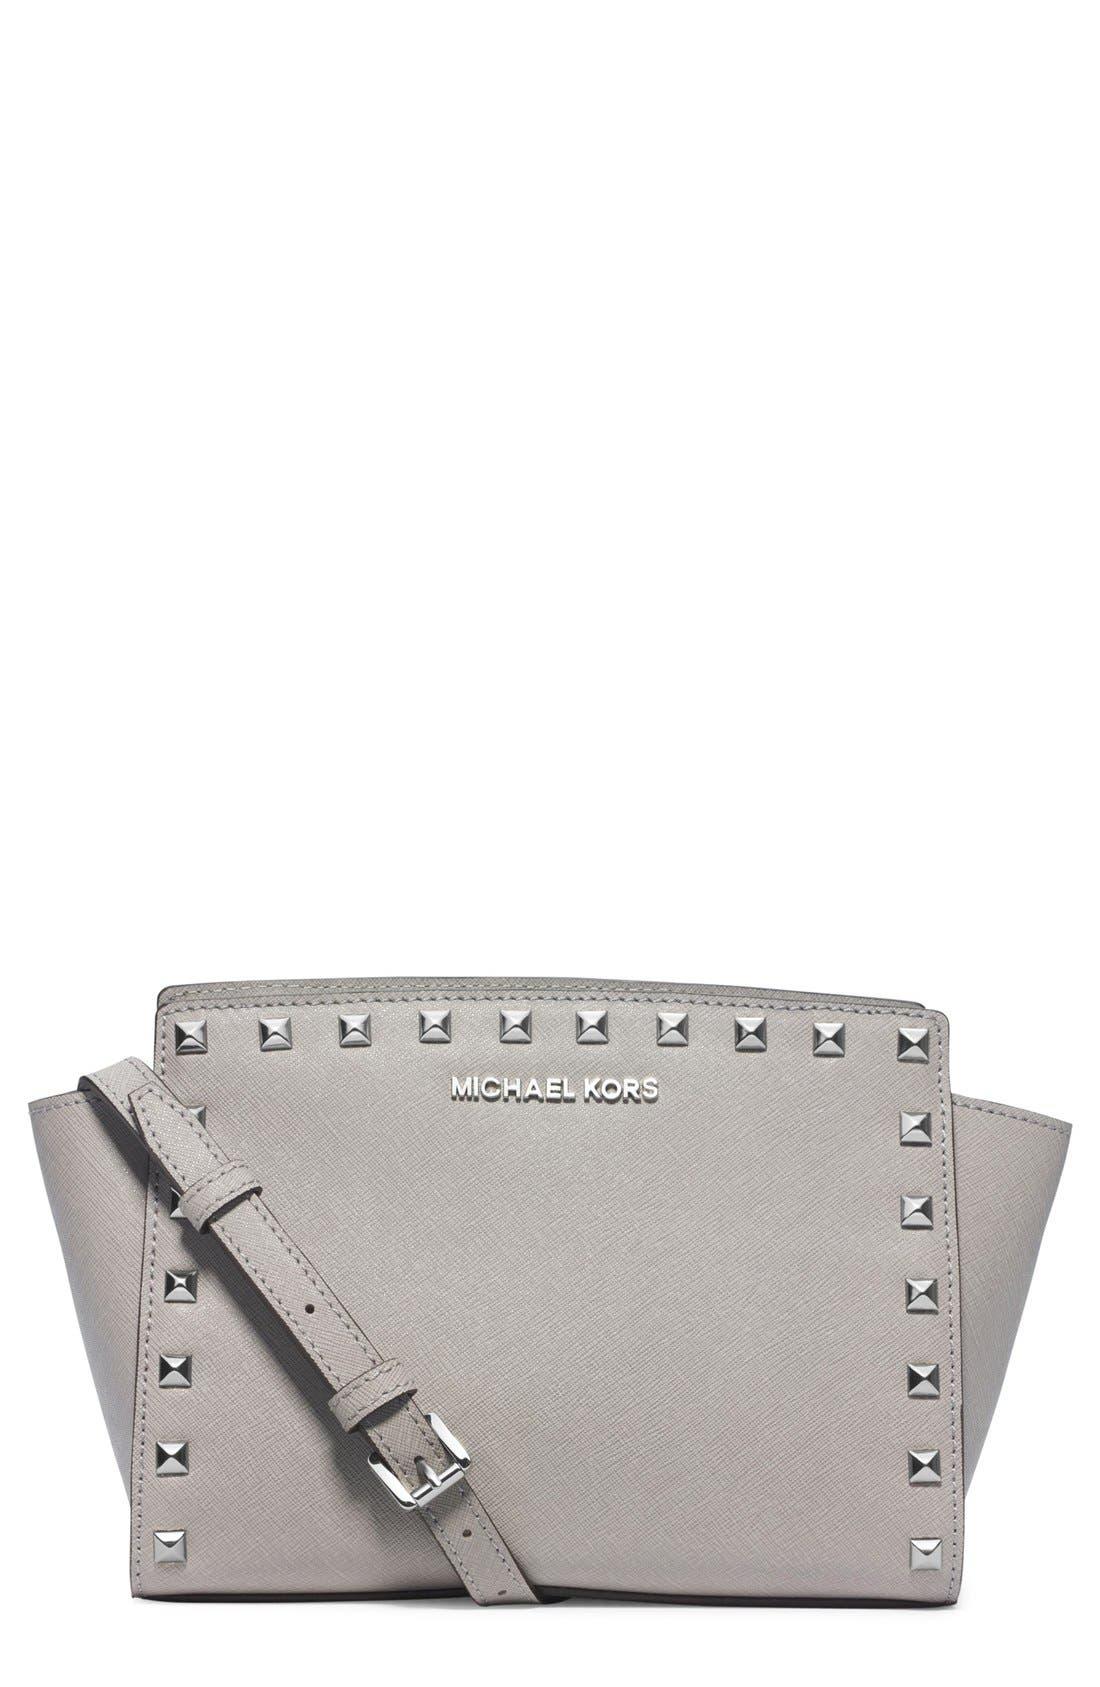 Main Image - MICHAEL Michael Kors 'Medium Selma' Studded Saffiano Leather Crossbody Bag